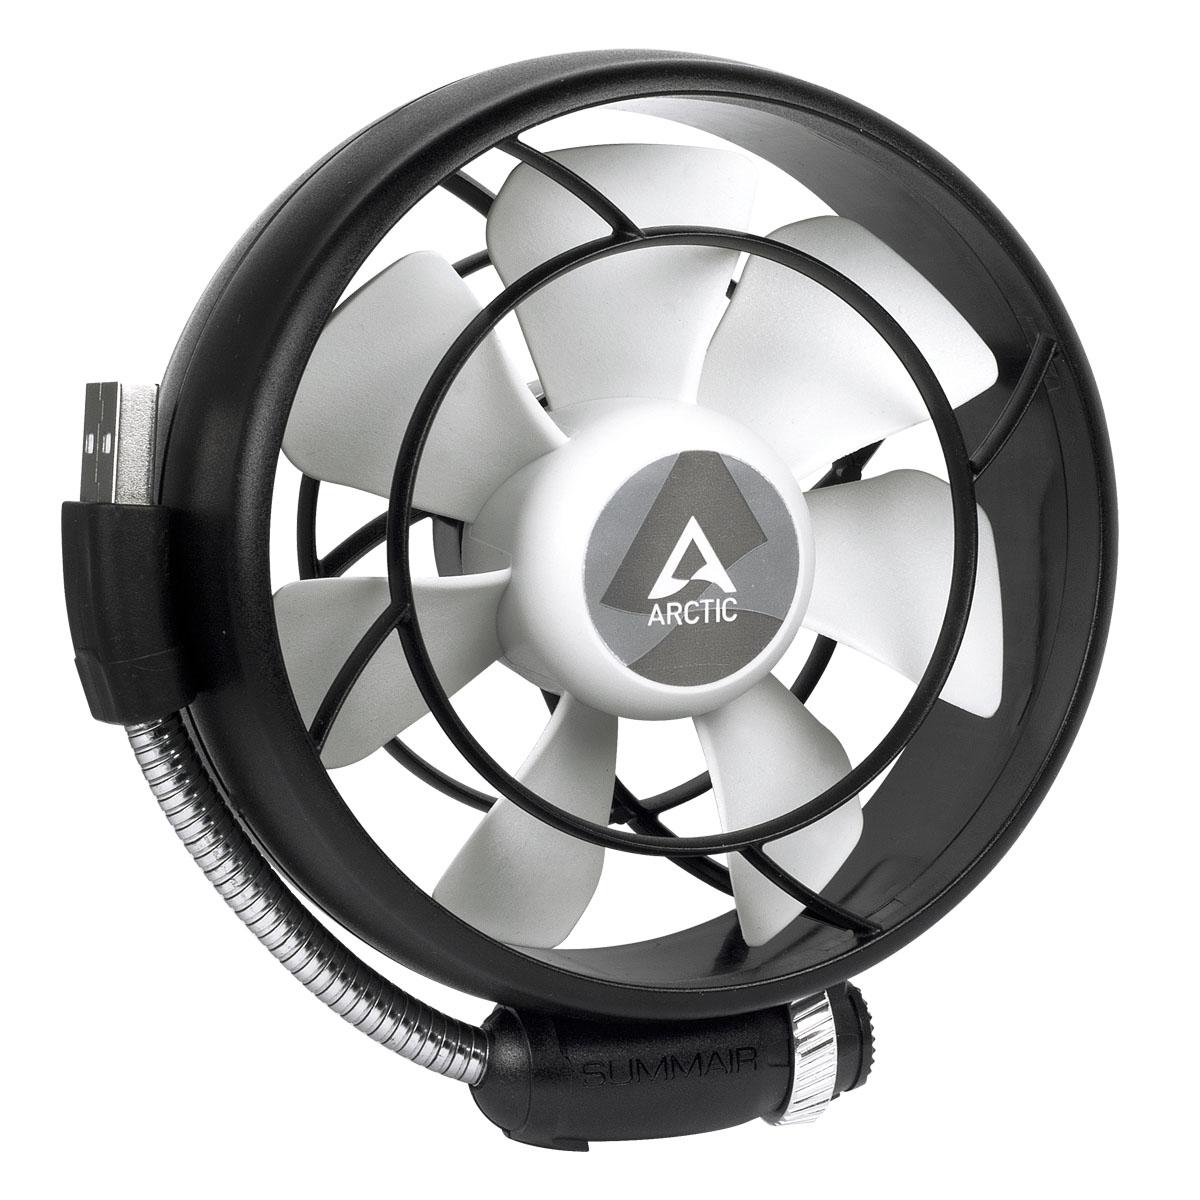 ARCTIC Summair Light/A